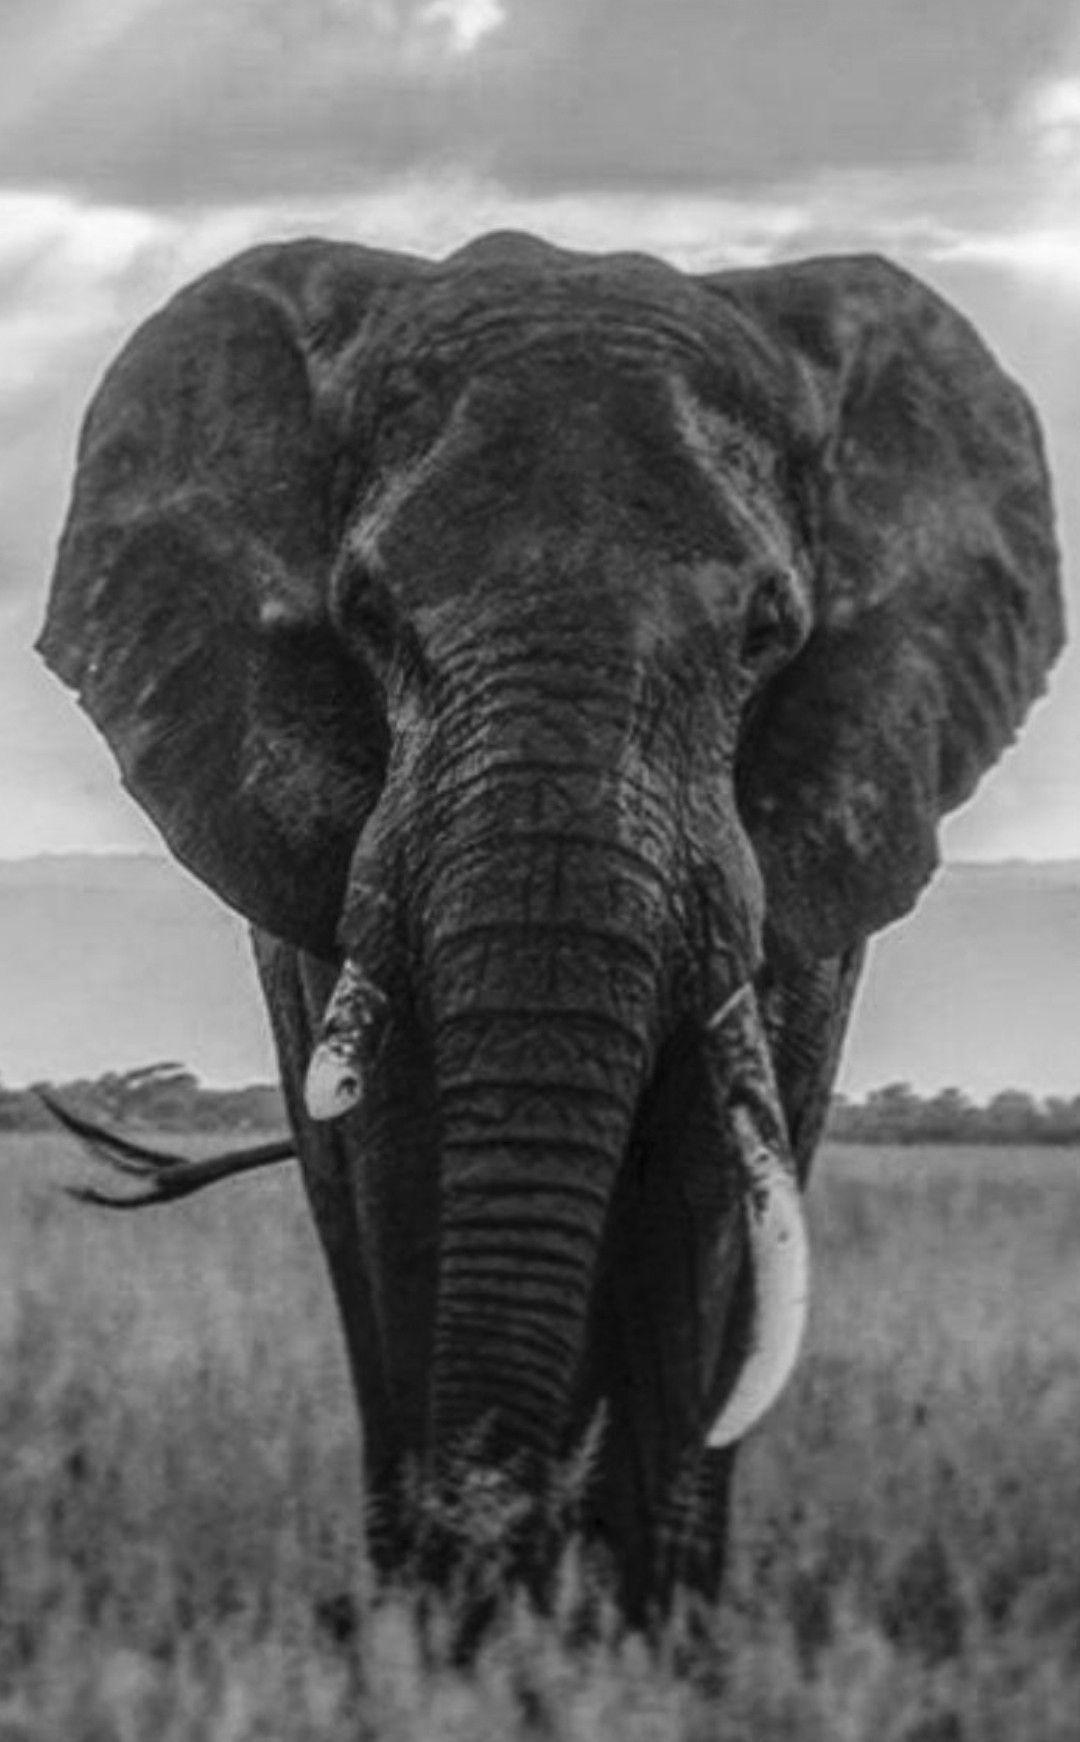 Pin de Maura Fashjian en ELEPHANTS | Pinterest | Elefantes, Reino ...